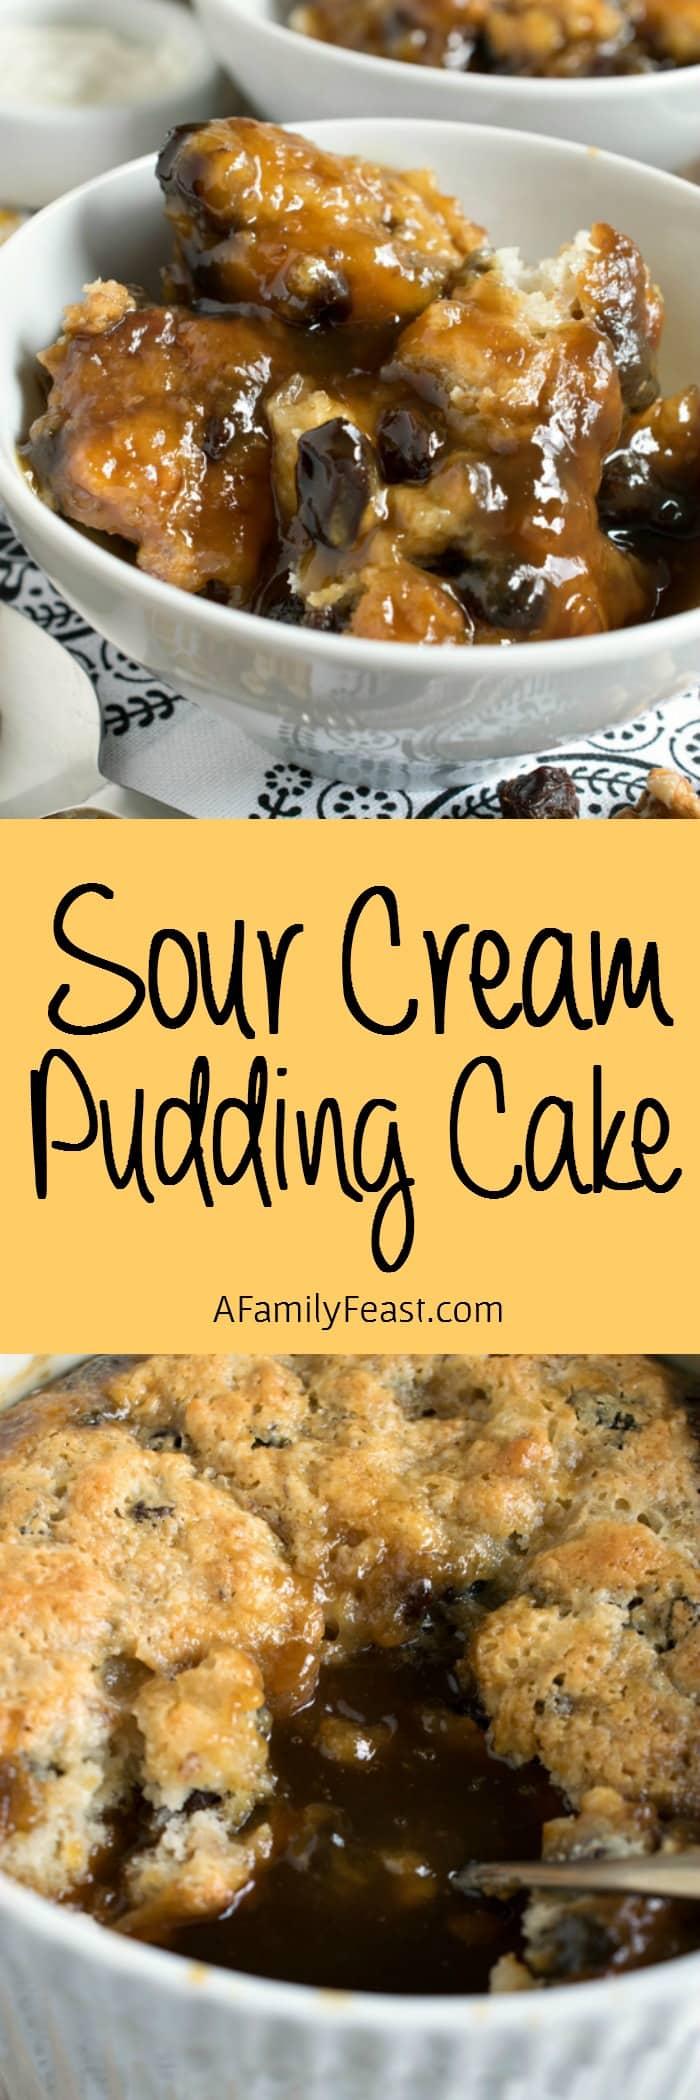 Hot Caramel Pudding Cake Recipe